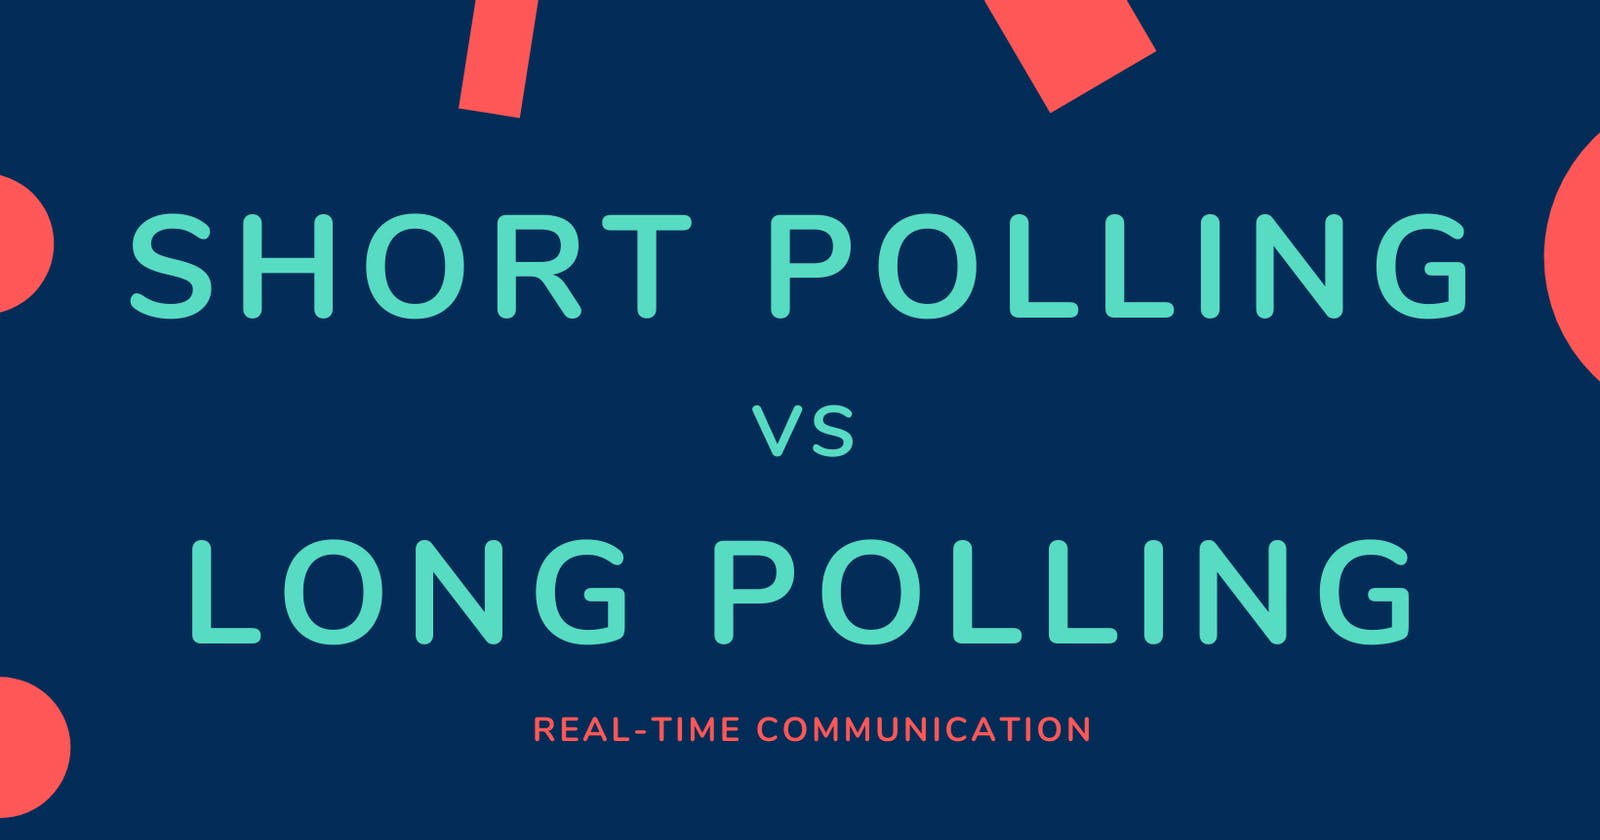 Short Polling vs Long Polling